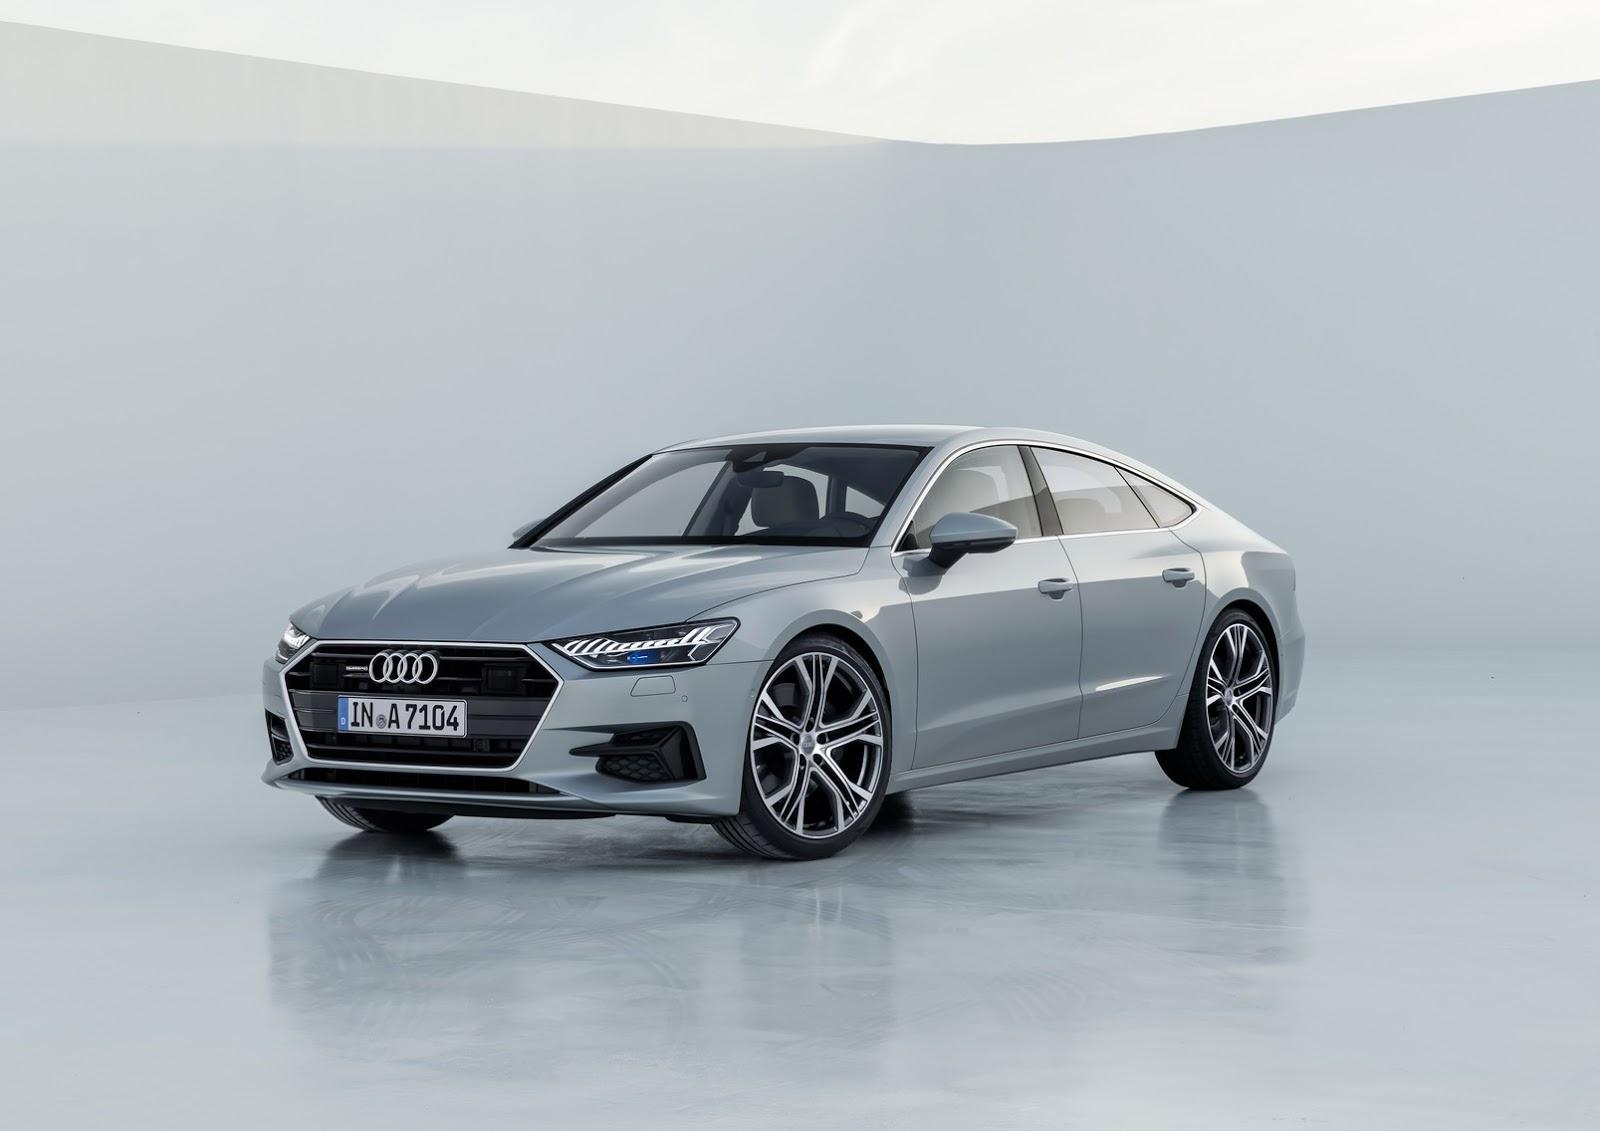 2018_Audi_A7_Sportback_0000